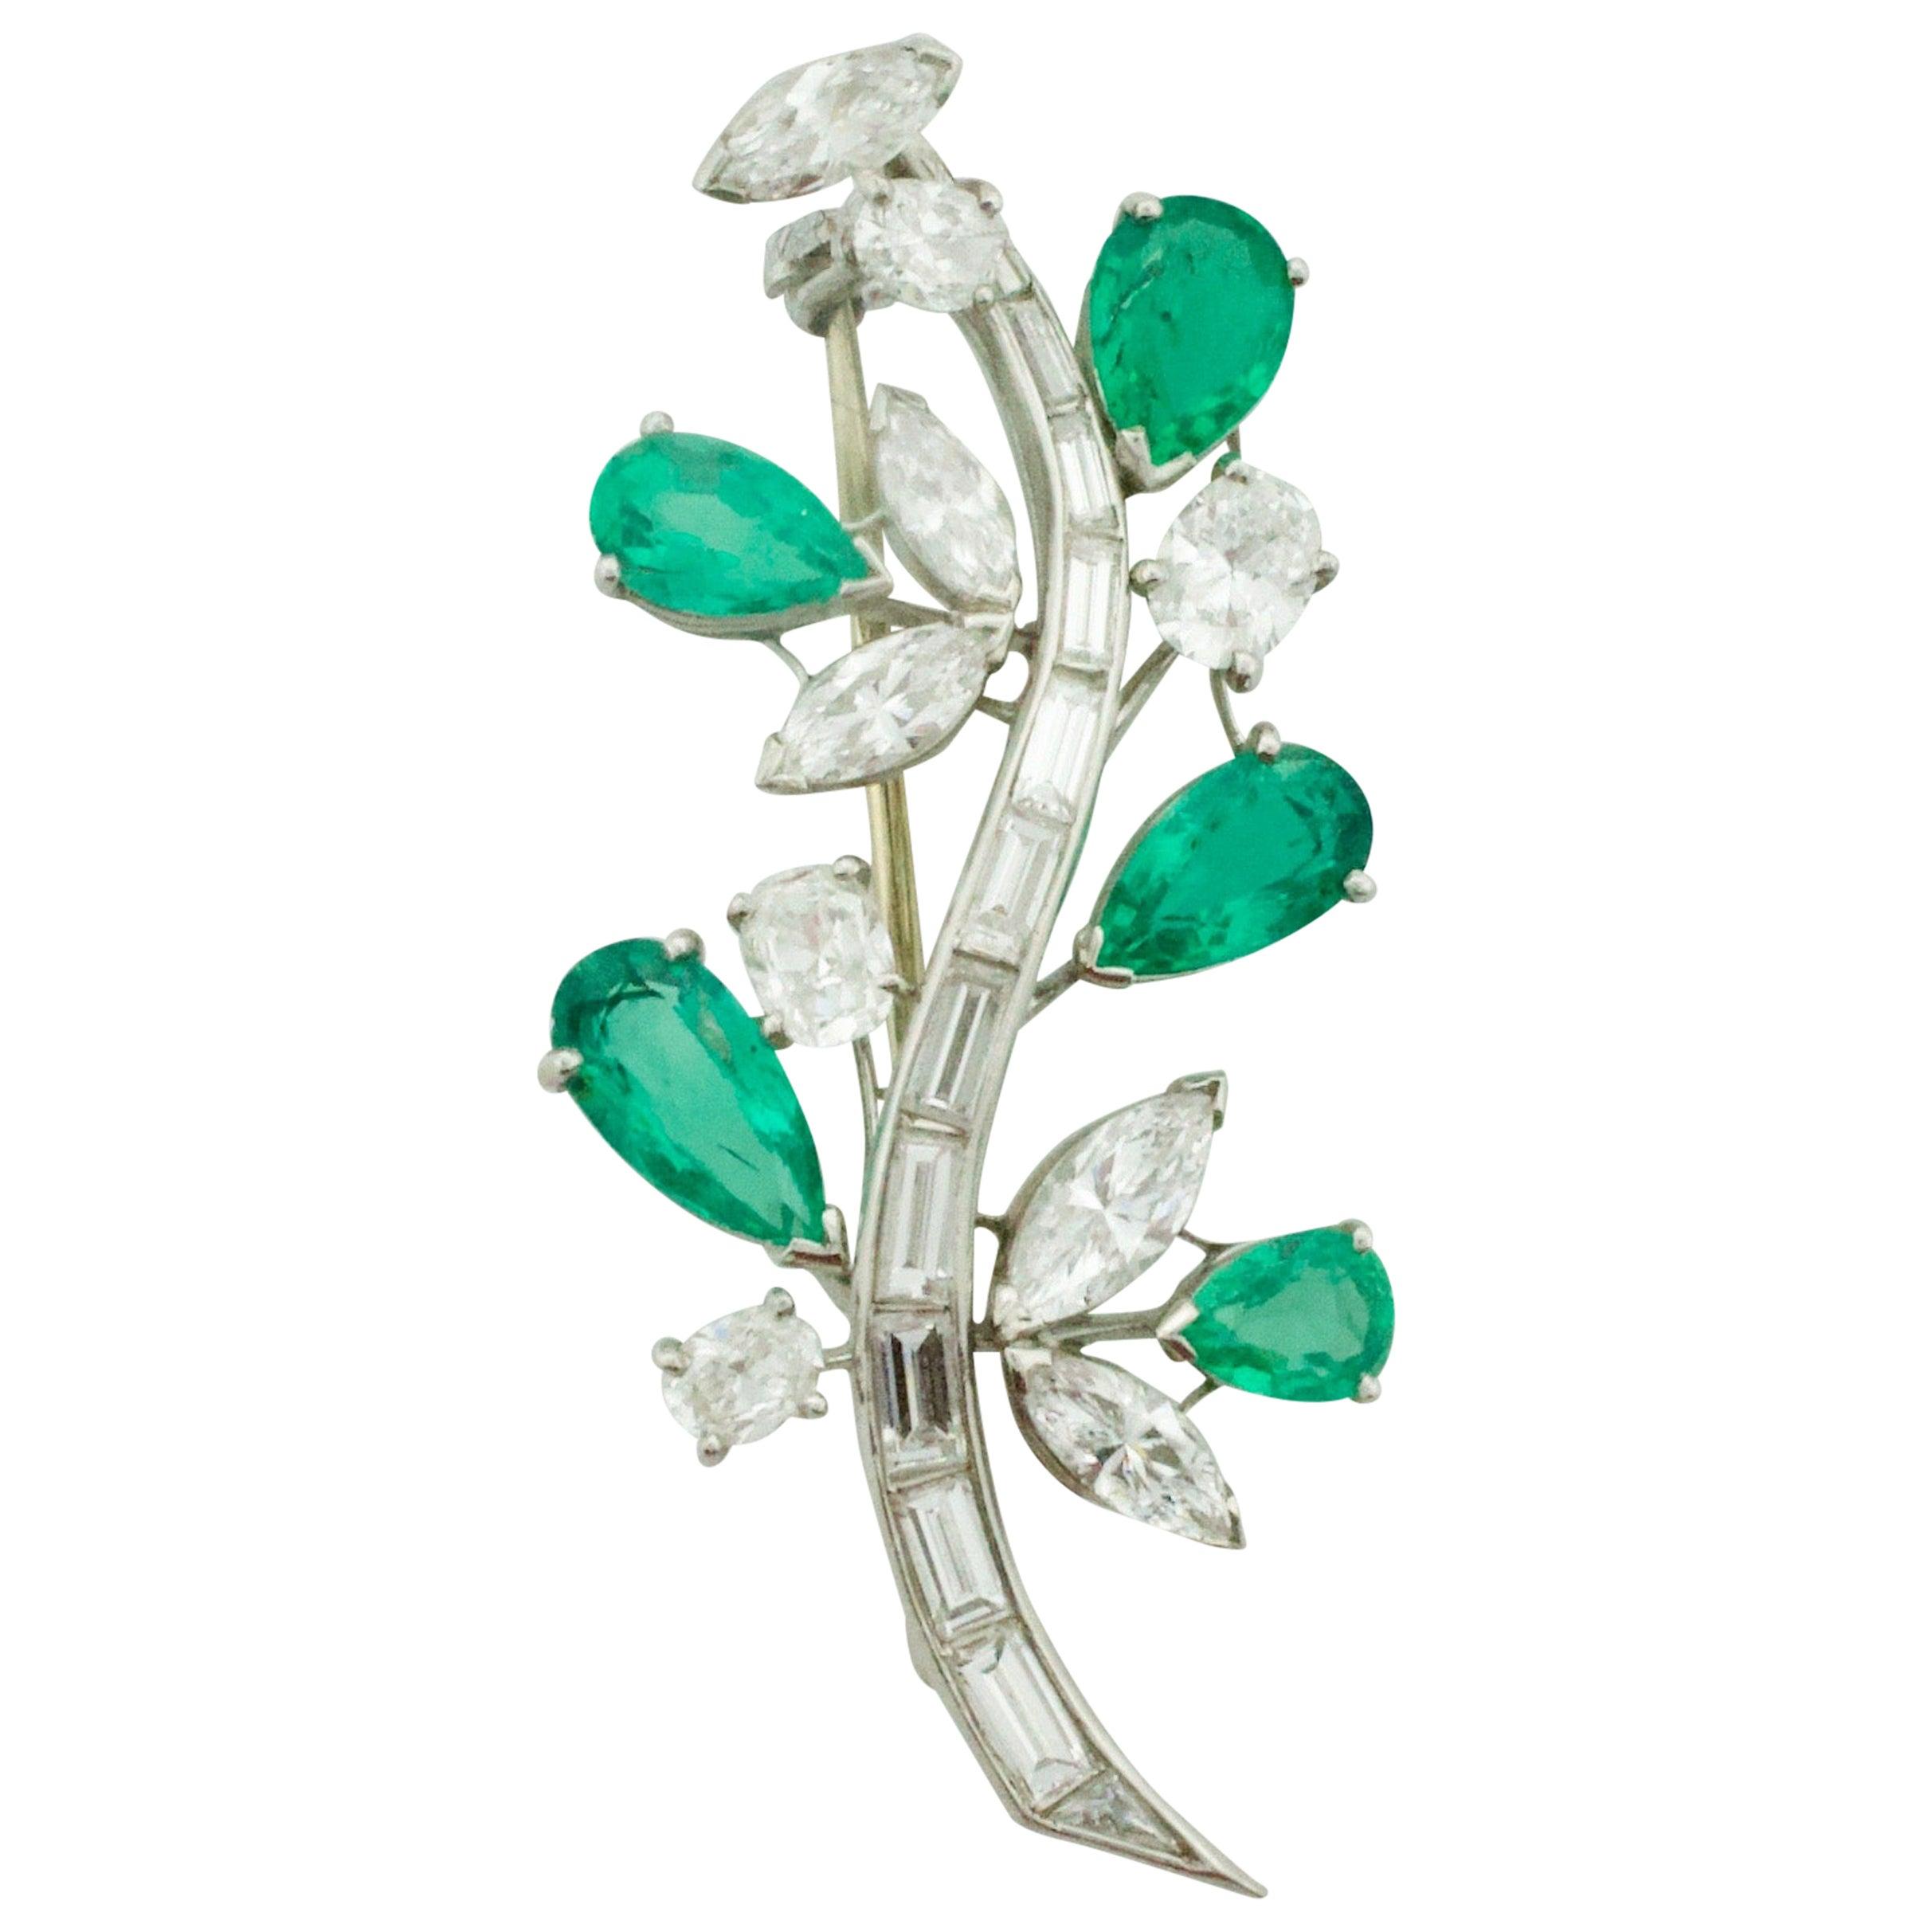 Flora and Fauna Emerald and Diamond Brooch in Platinum, circa 1940s